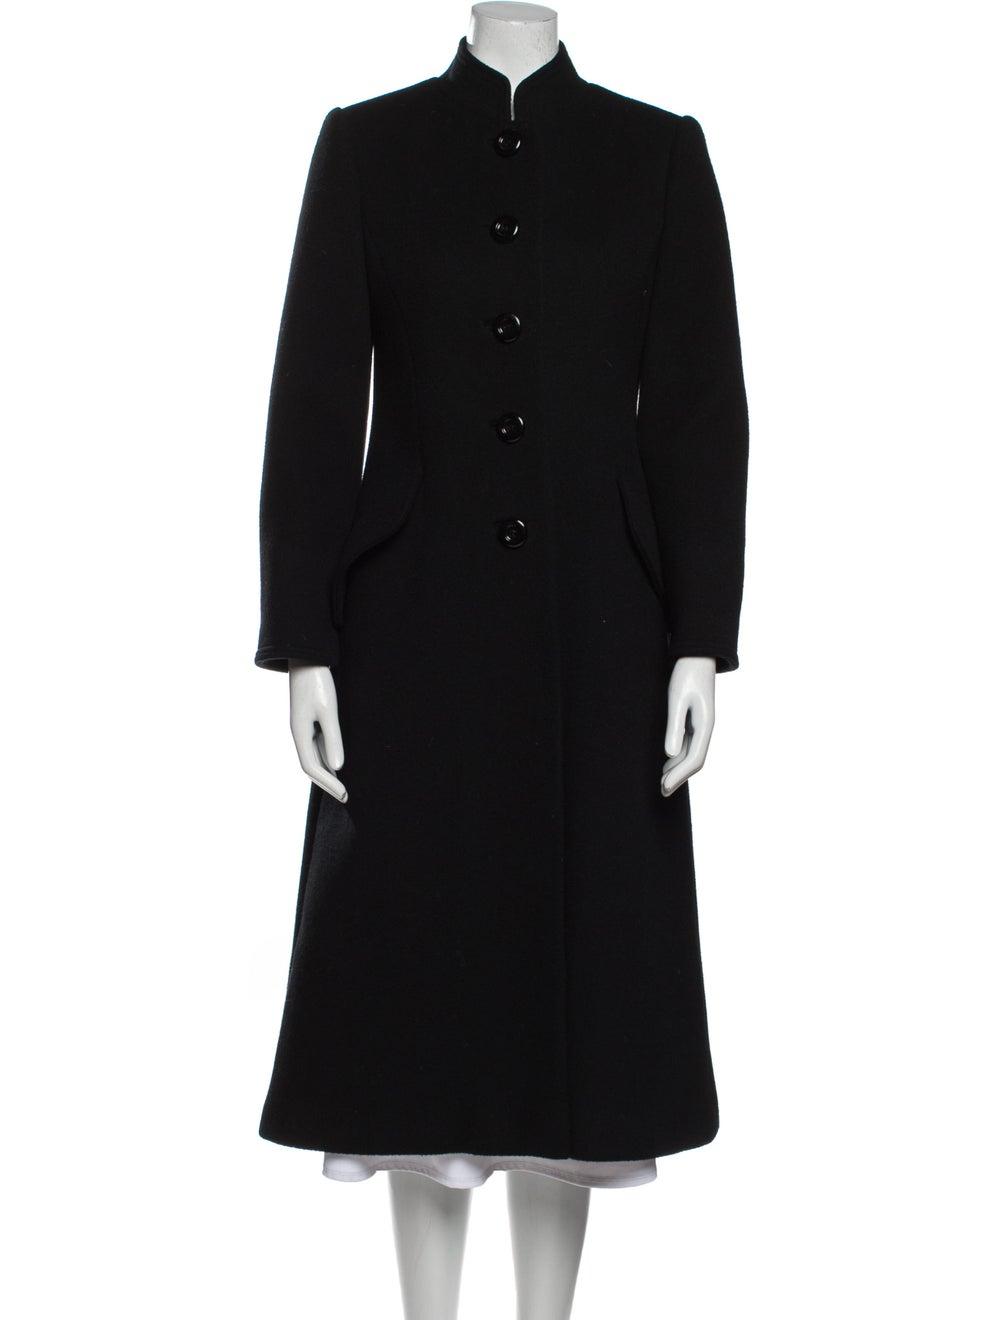 Pauline Trigere Coat Black - image 1